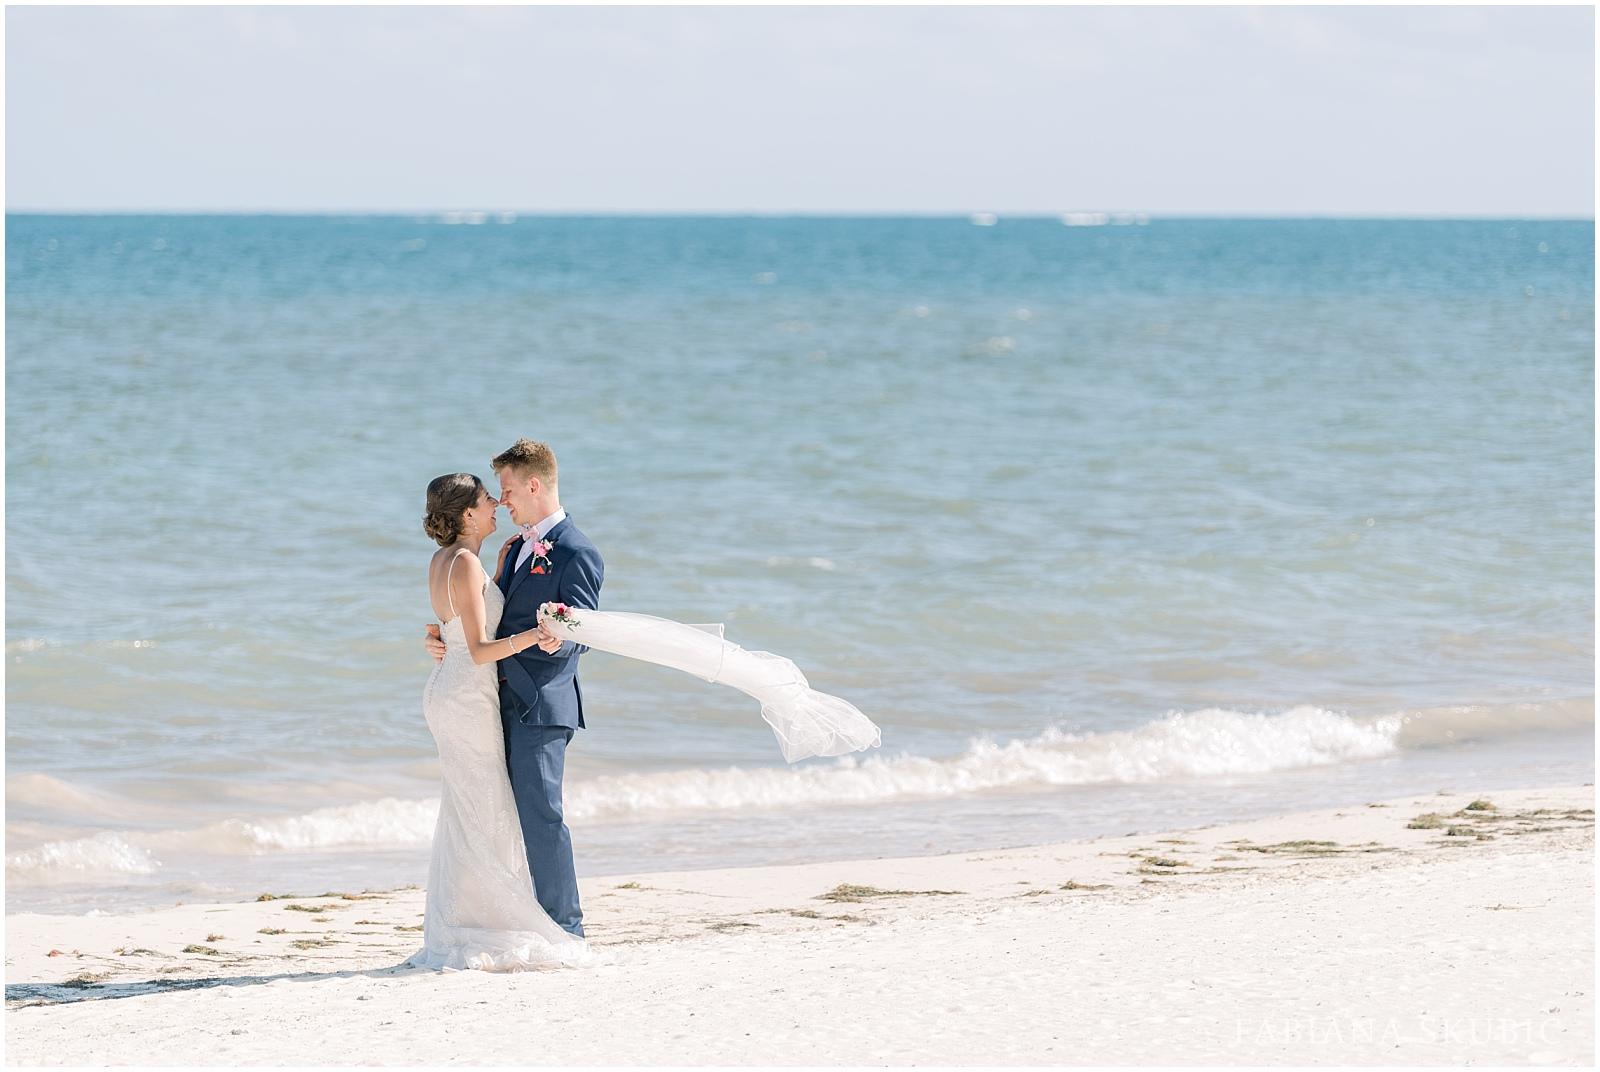 TJ_Now_Sapphire_Riviera_Cancun_Mexico_Wedding_Photos_0200.jpg